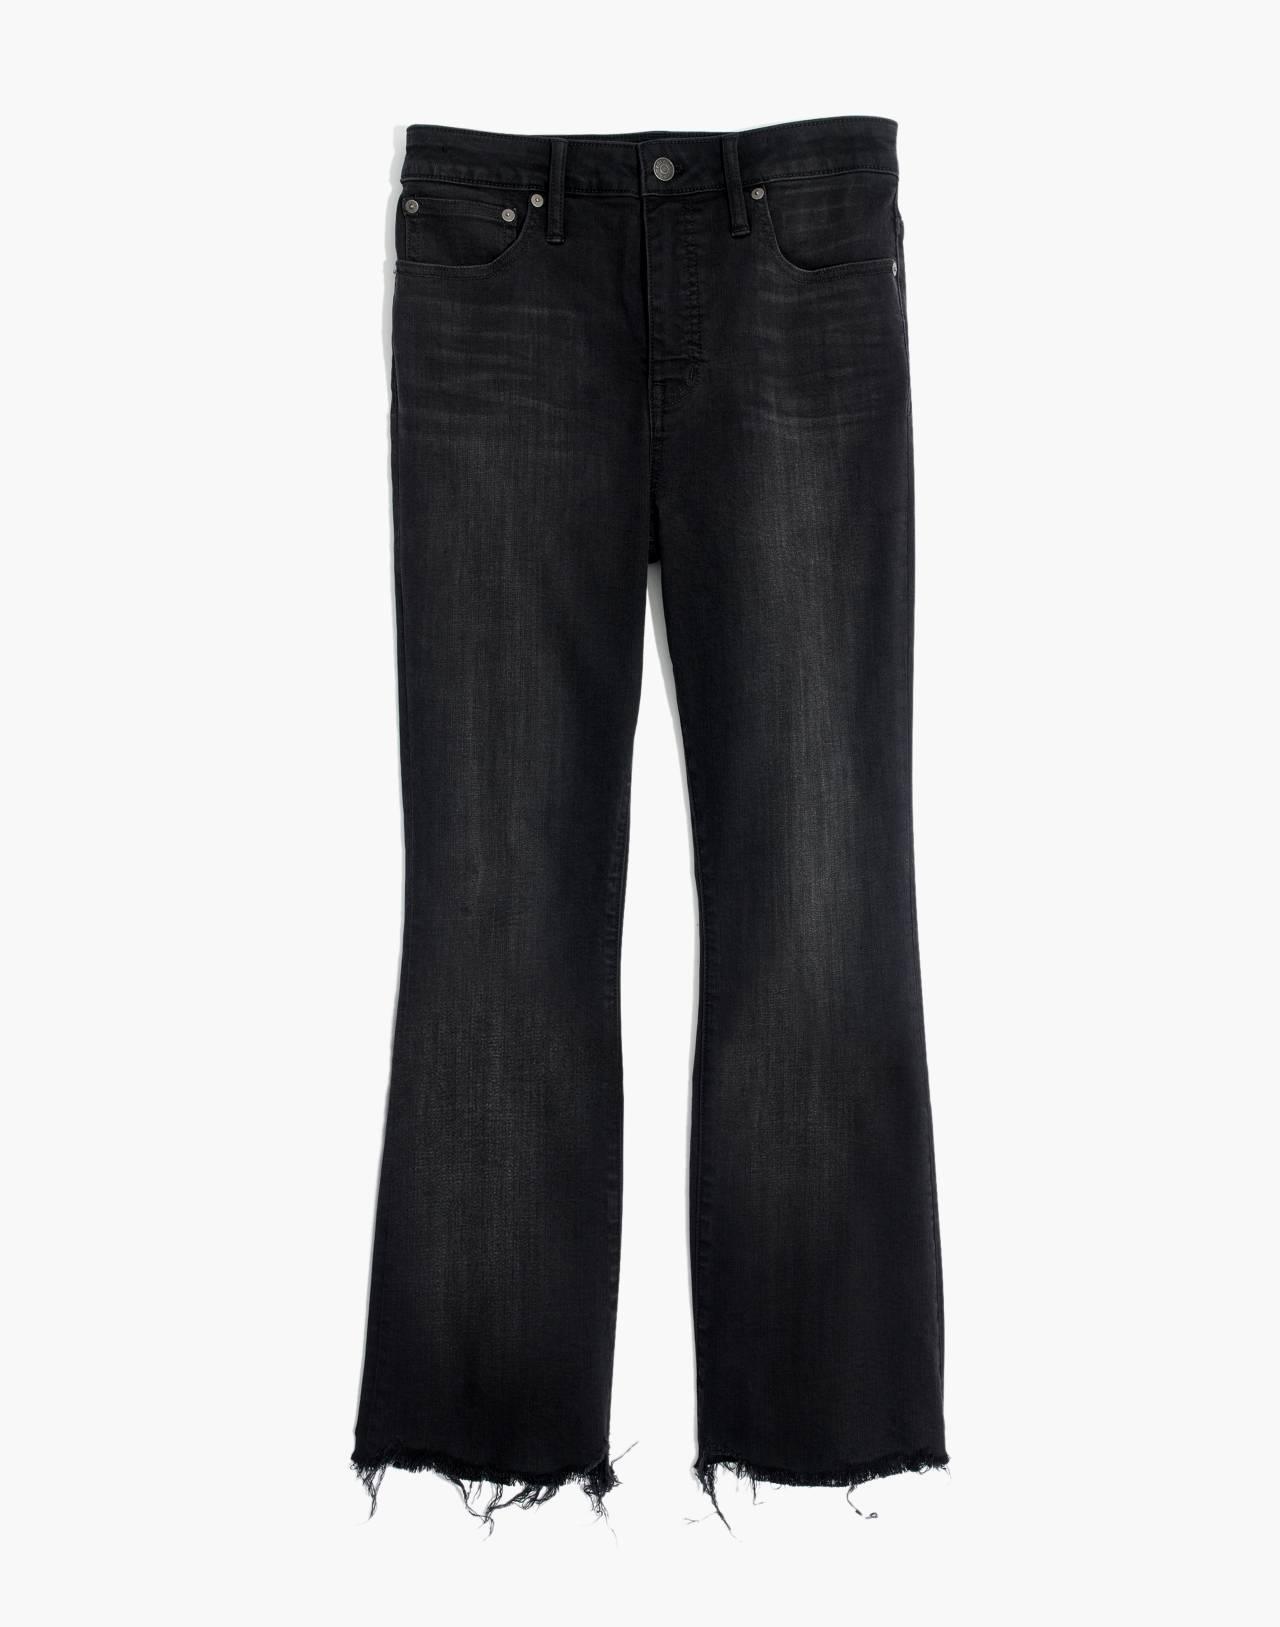 Tall Curvy Cali Demi-Boot Jeans in Berkeley Black: Chewed-Hem Edition in berkeley wash image 4